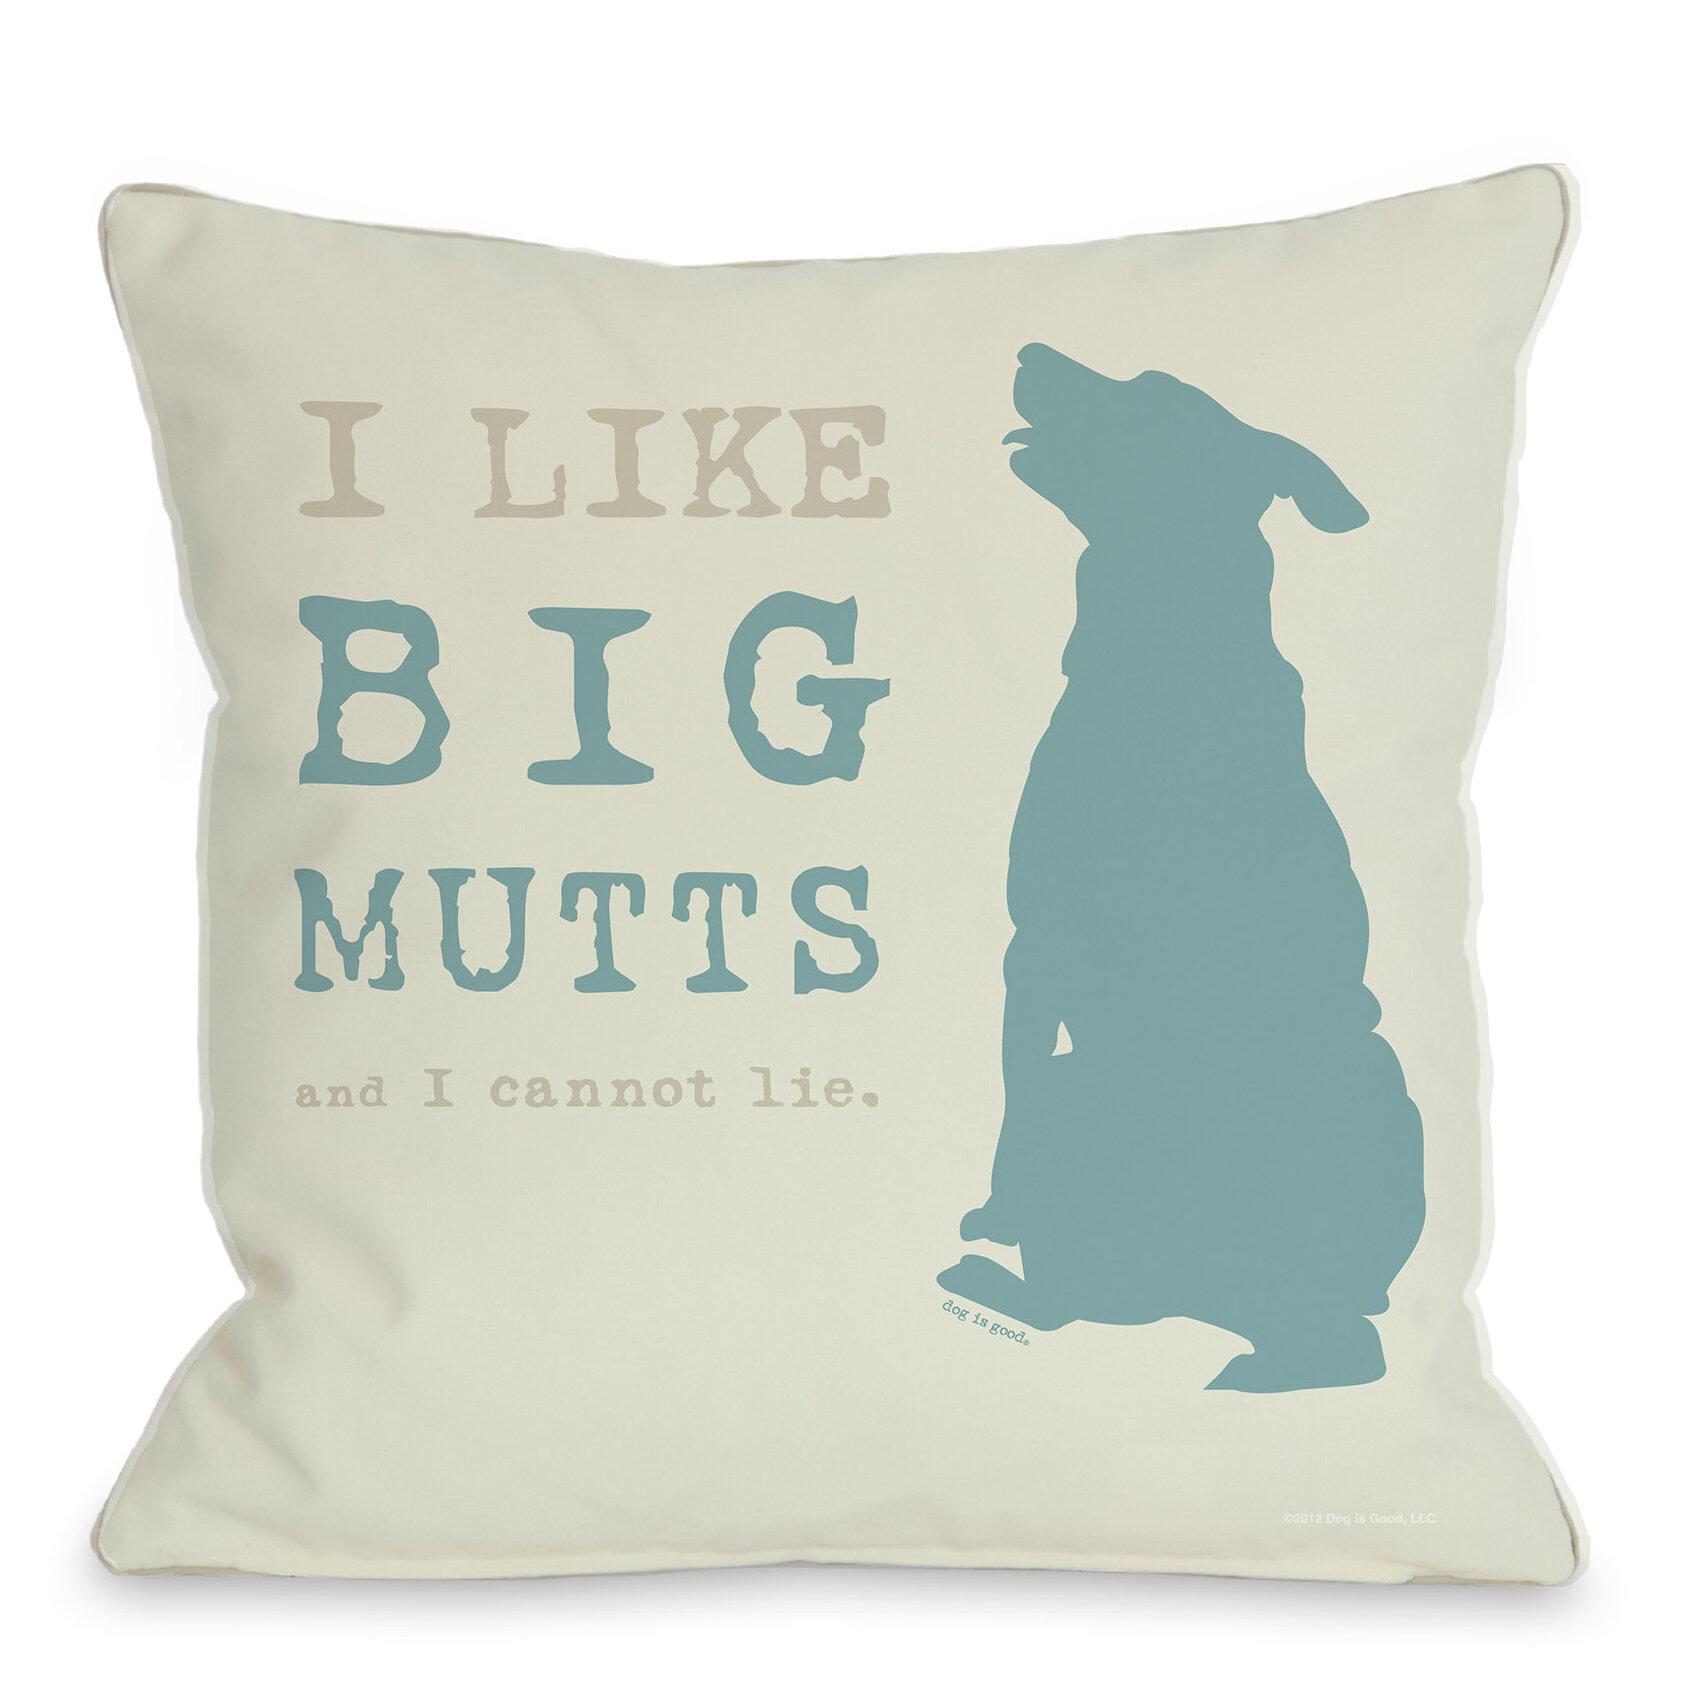 Winston Porter Kaelan I Like Big Mutts Throw Pillow Reviews Wayfair